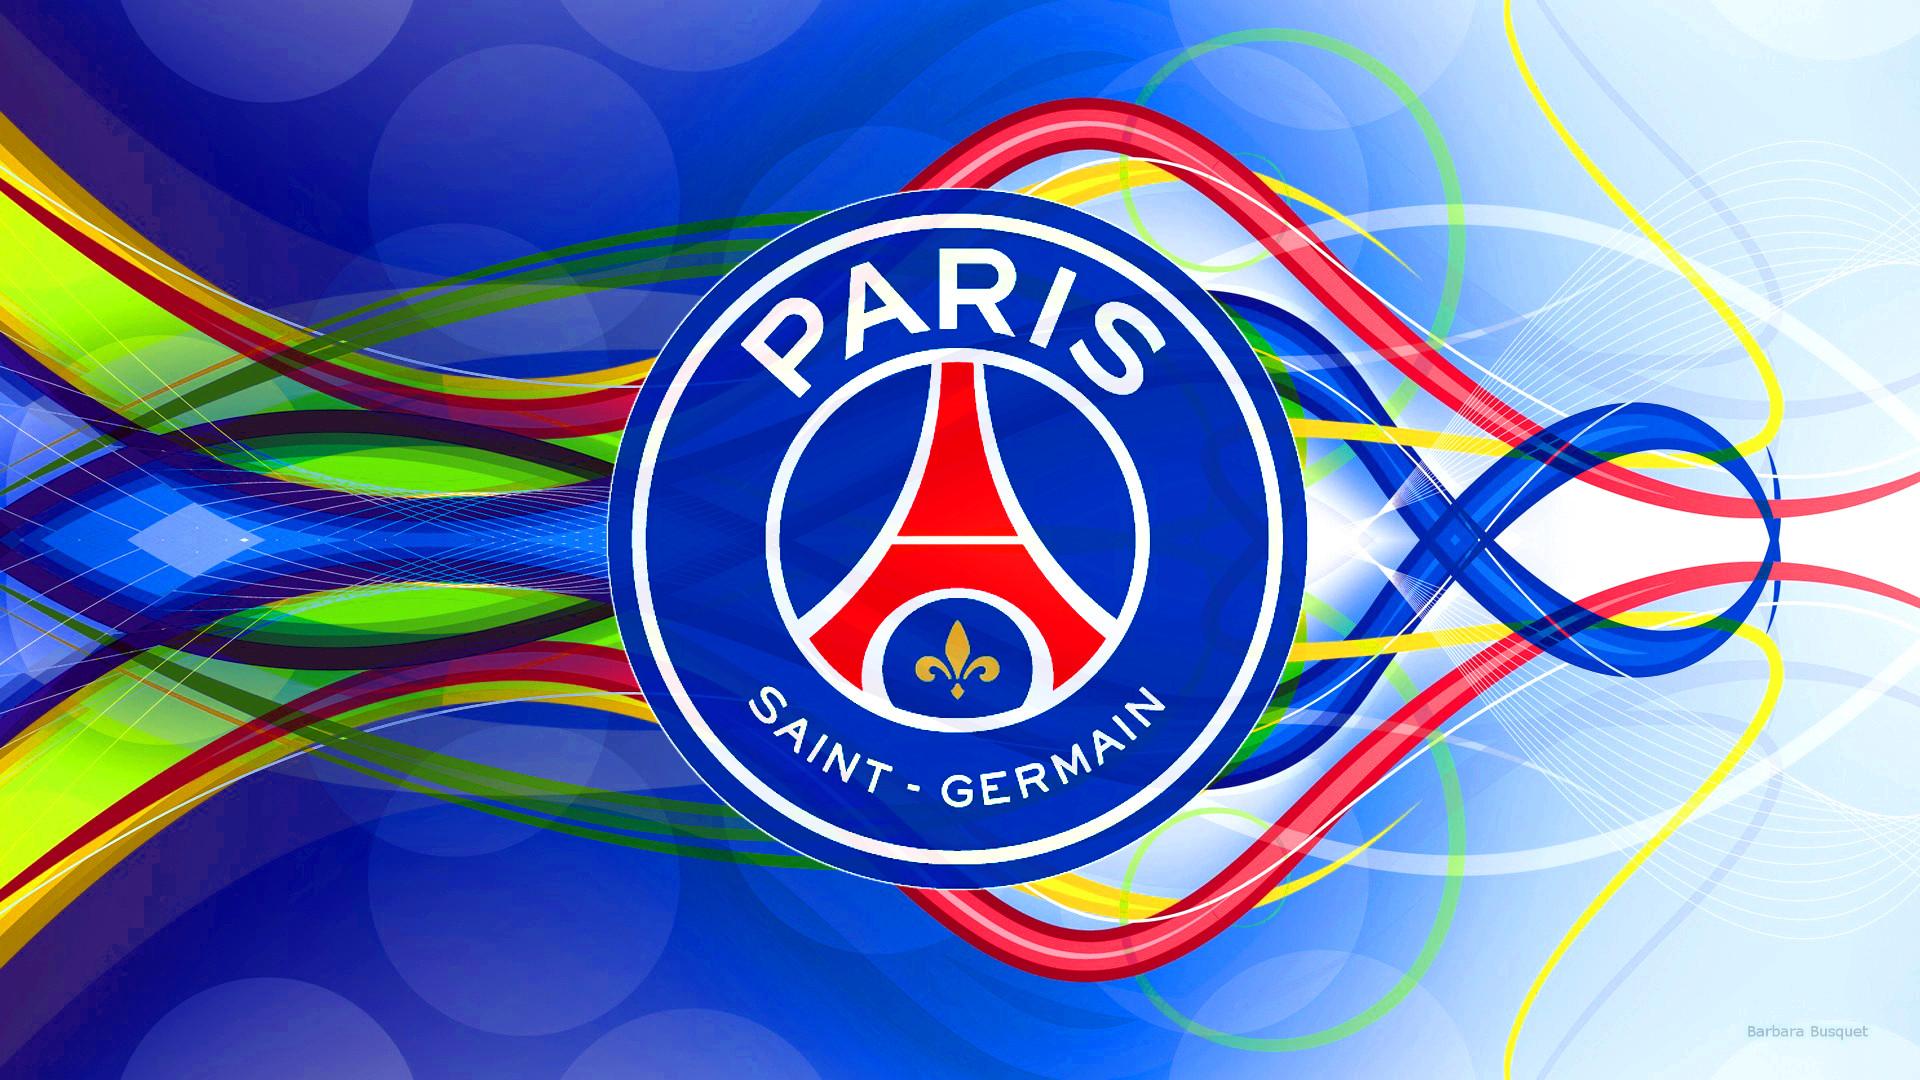 Res: 1920x1080, Blue Paris Saint-Germain logo wallpaper.